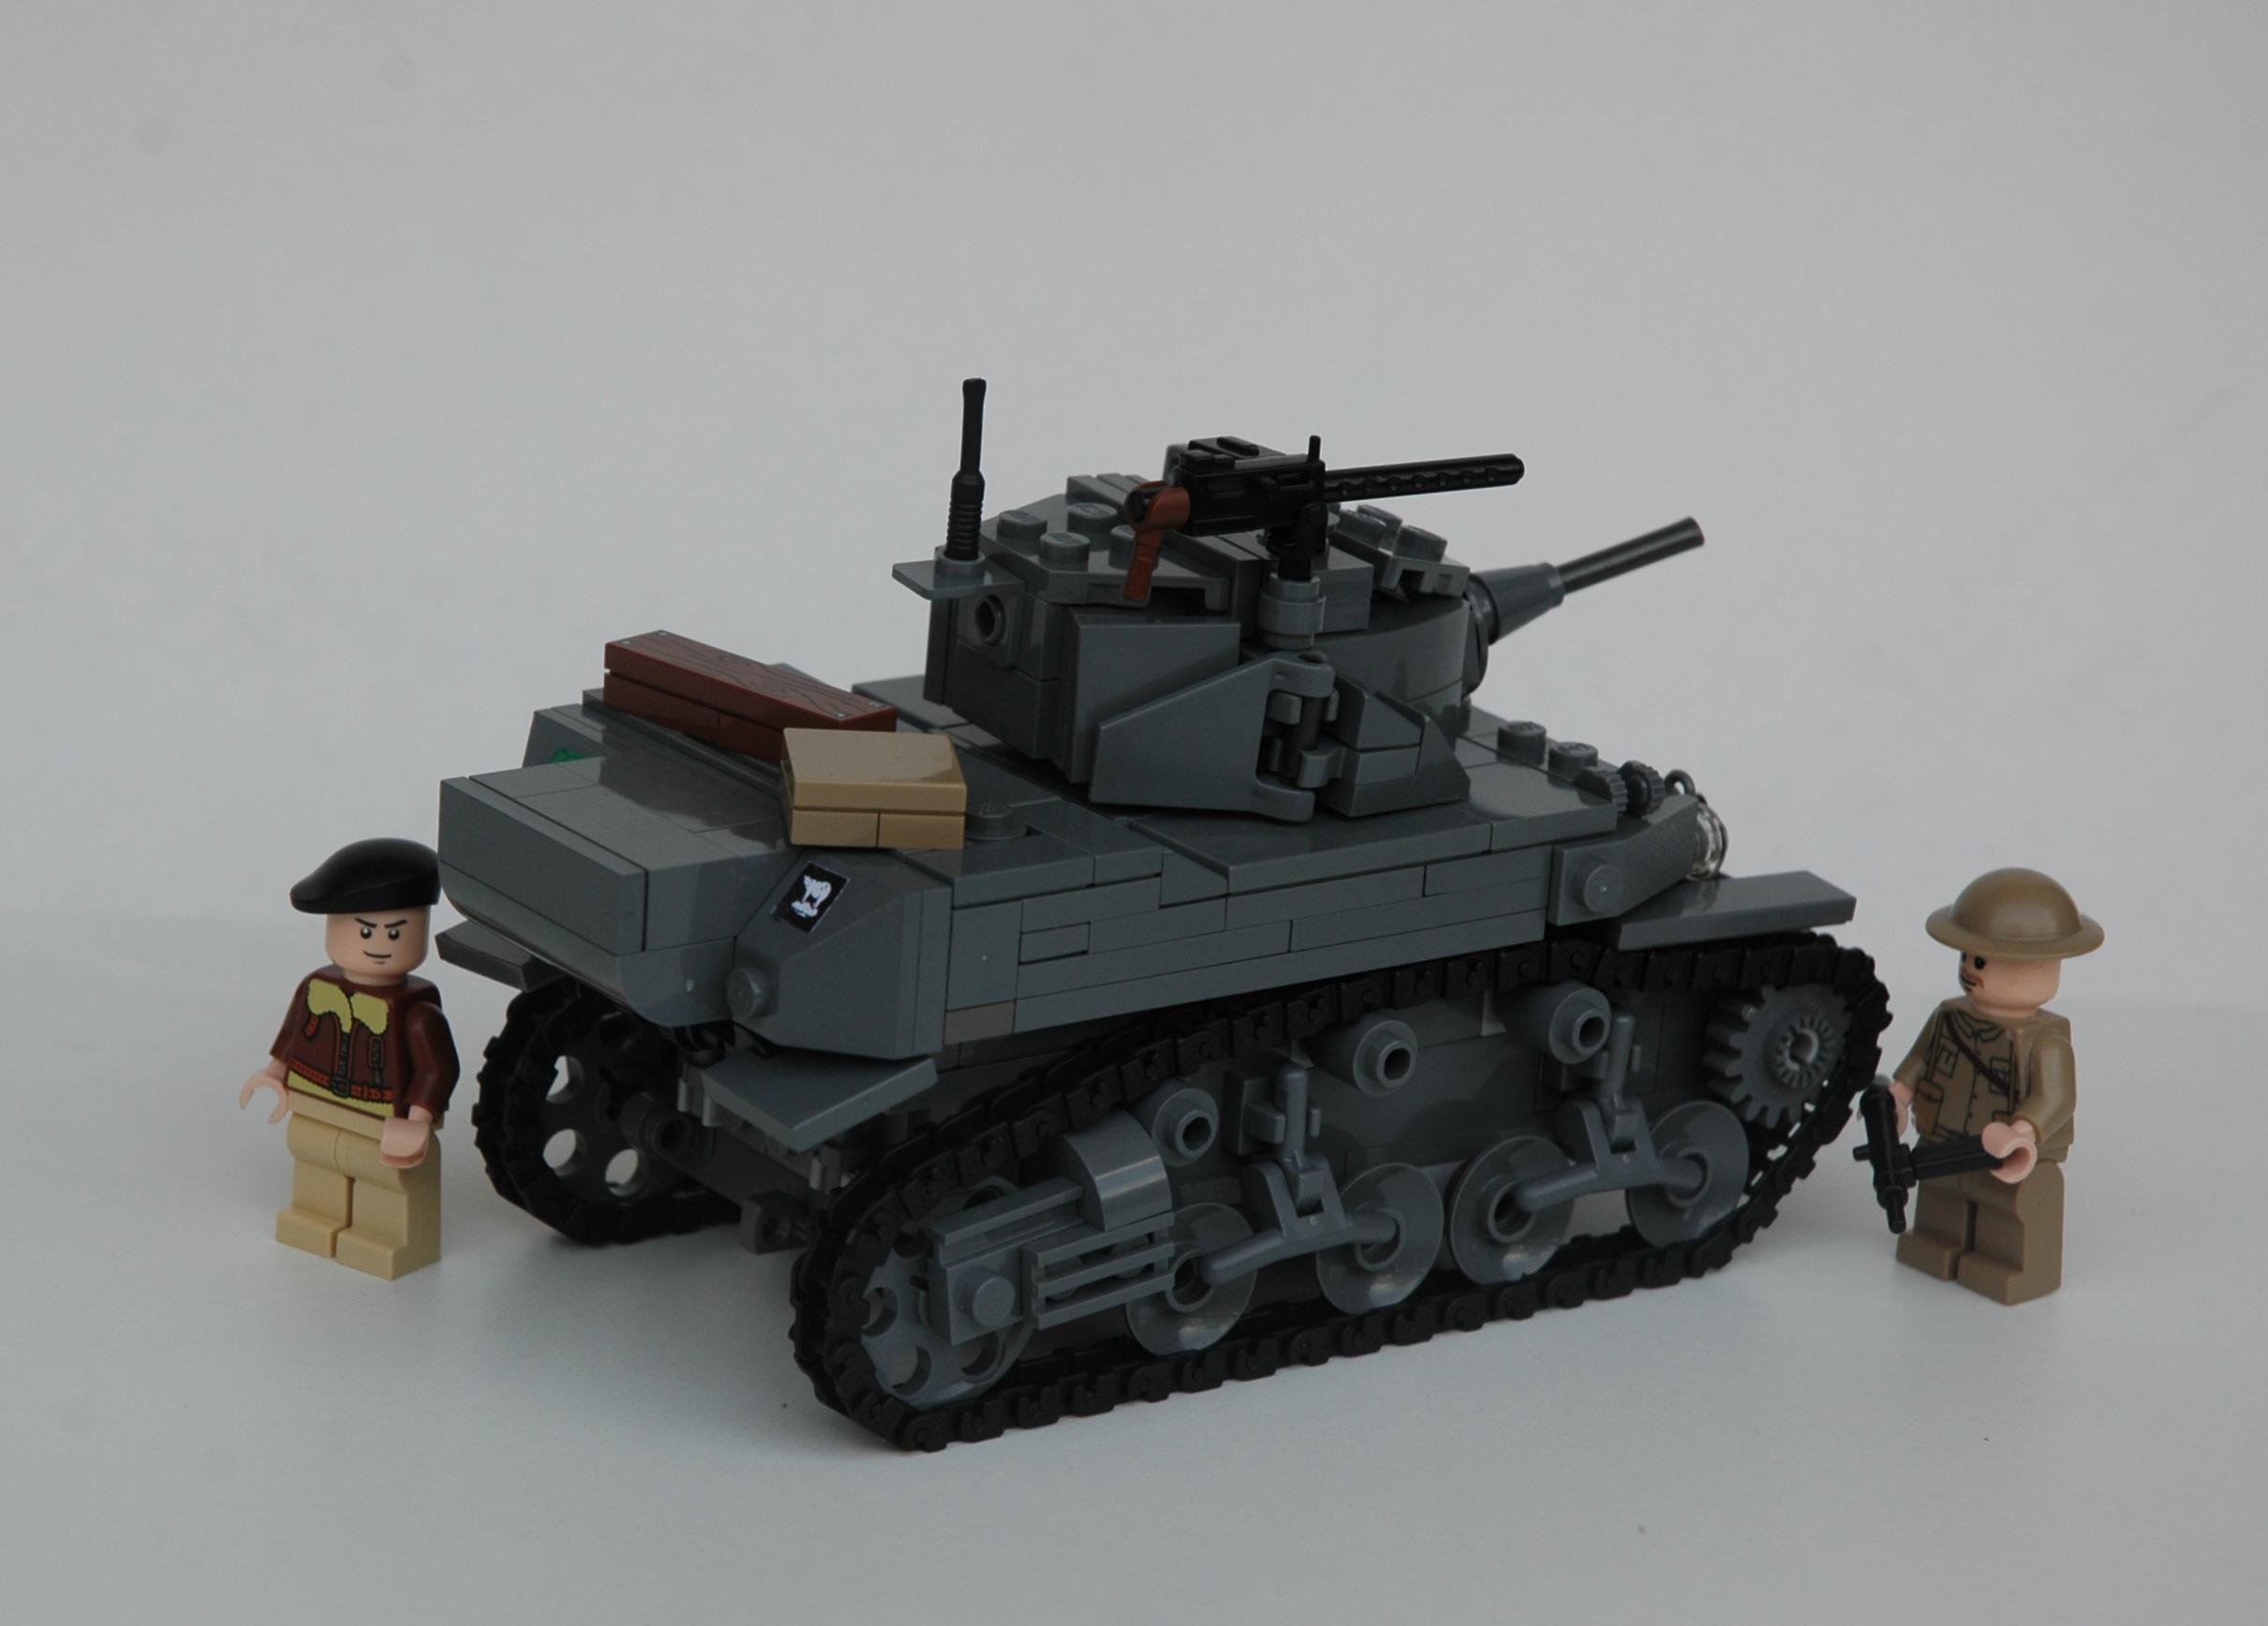 fond d 39 cran arme r servoir lego armure jouet britanique arm e recon lumi re la. Black Bedroom Furniture Sets. Home Design Ideas